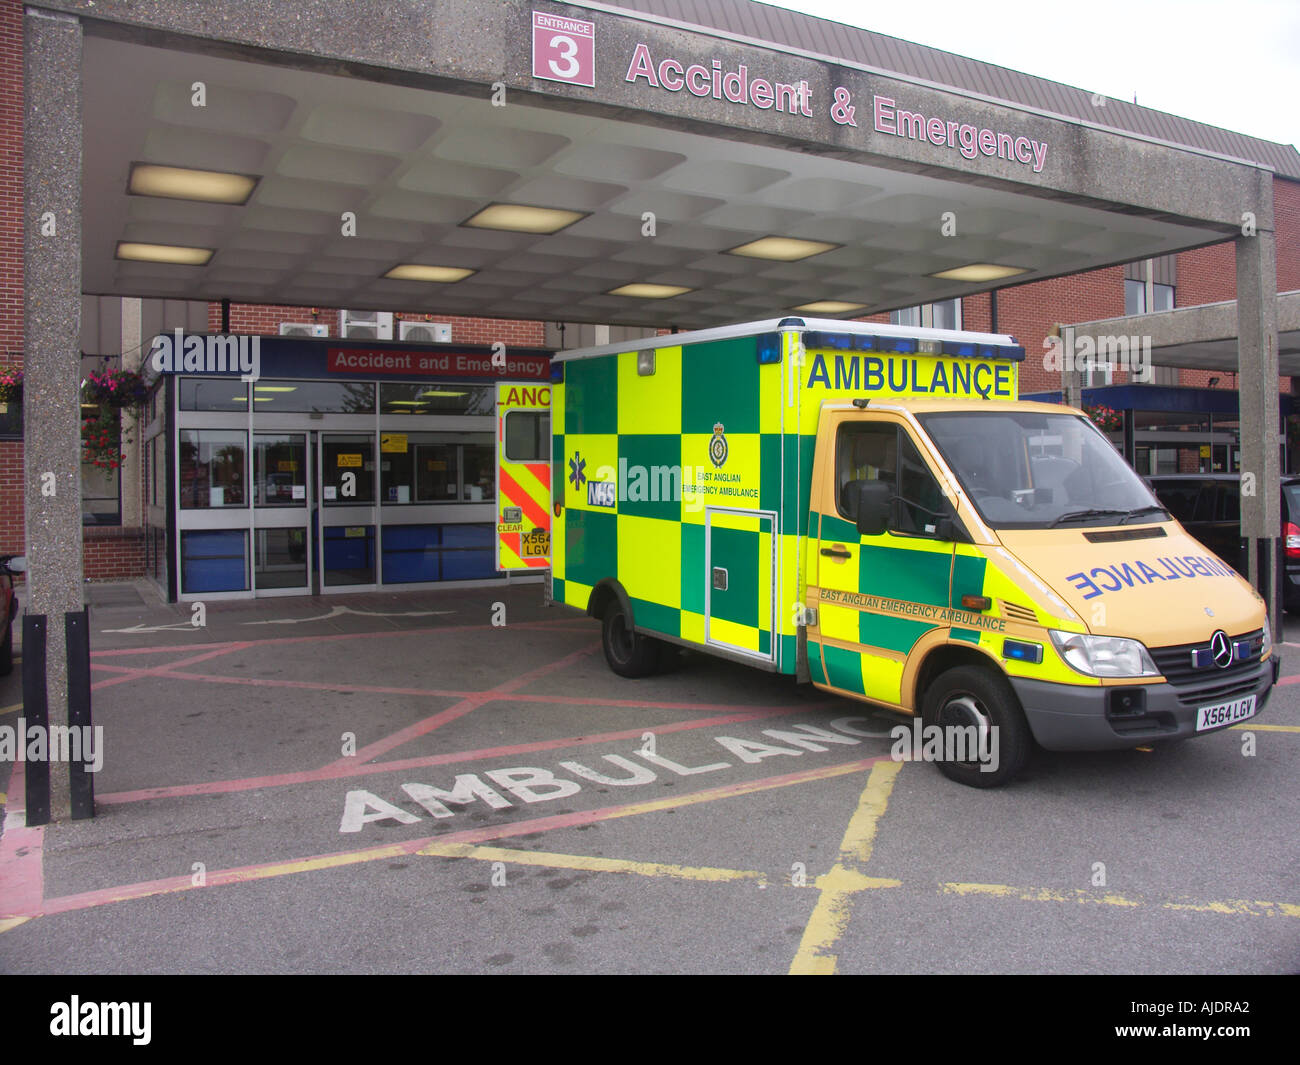 Ambulance accident and emergency Ipswich Hospital Suffolk